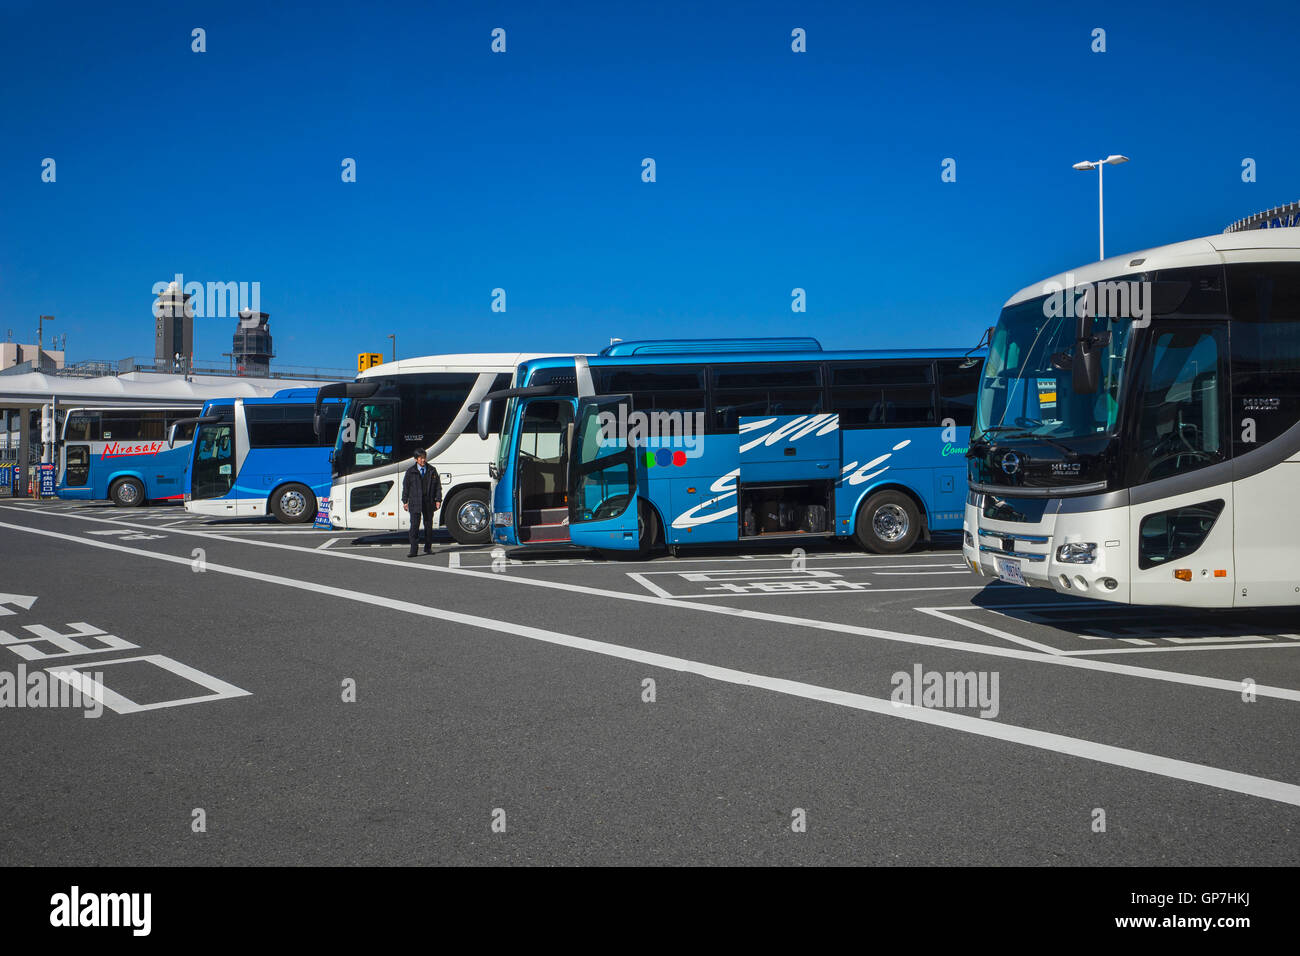 Buses parked at narita international airport, japan - Stock Image